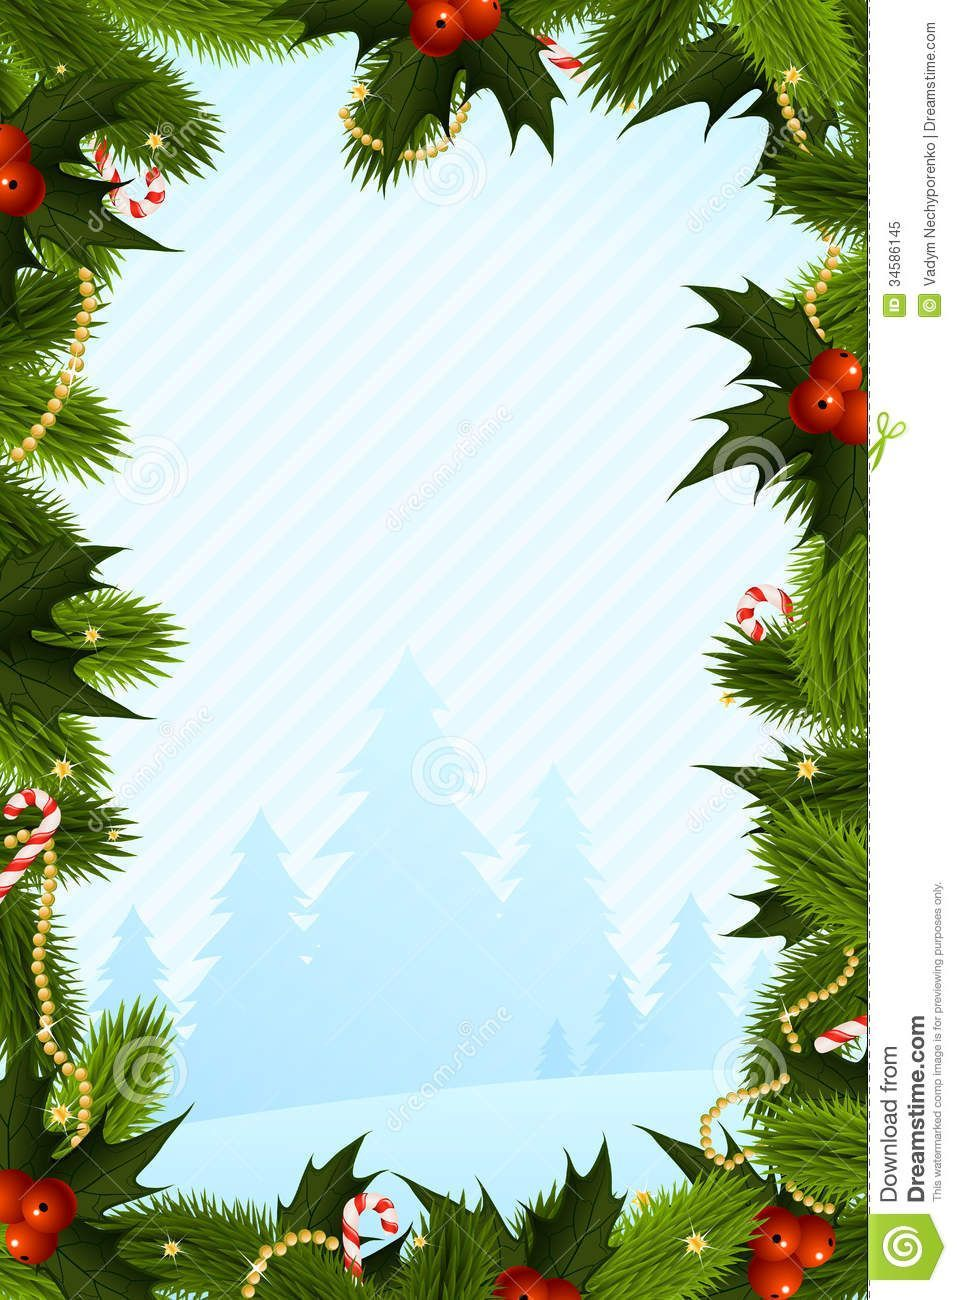 The Wonderful 043 Christmas Card Template Fir Trees Decorations Word Menu Reg Christmas Card Templates Free Holiday Card Template Christmas Photo Card Template Microsoft word christmas card templates